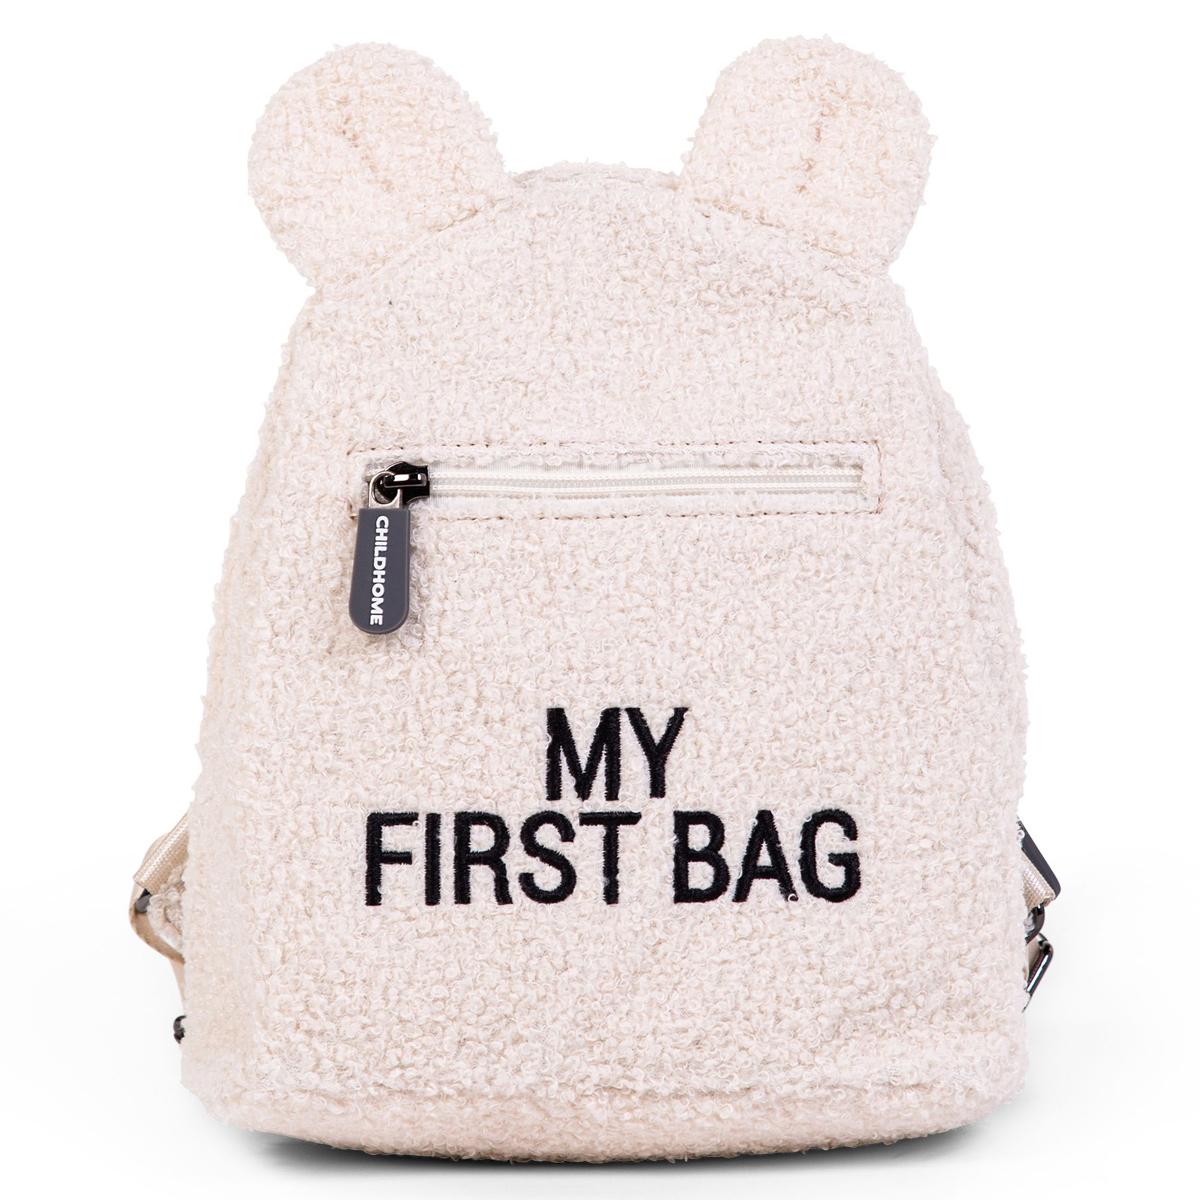 Bagagerie enfant Sac à Dos My First Bag - Teddy Ecru Sac à Dos My First Bag - Teddy Ecru